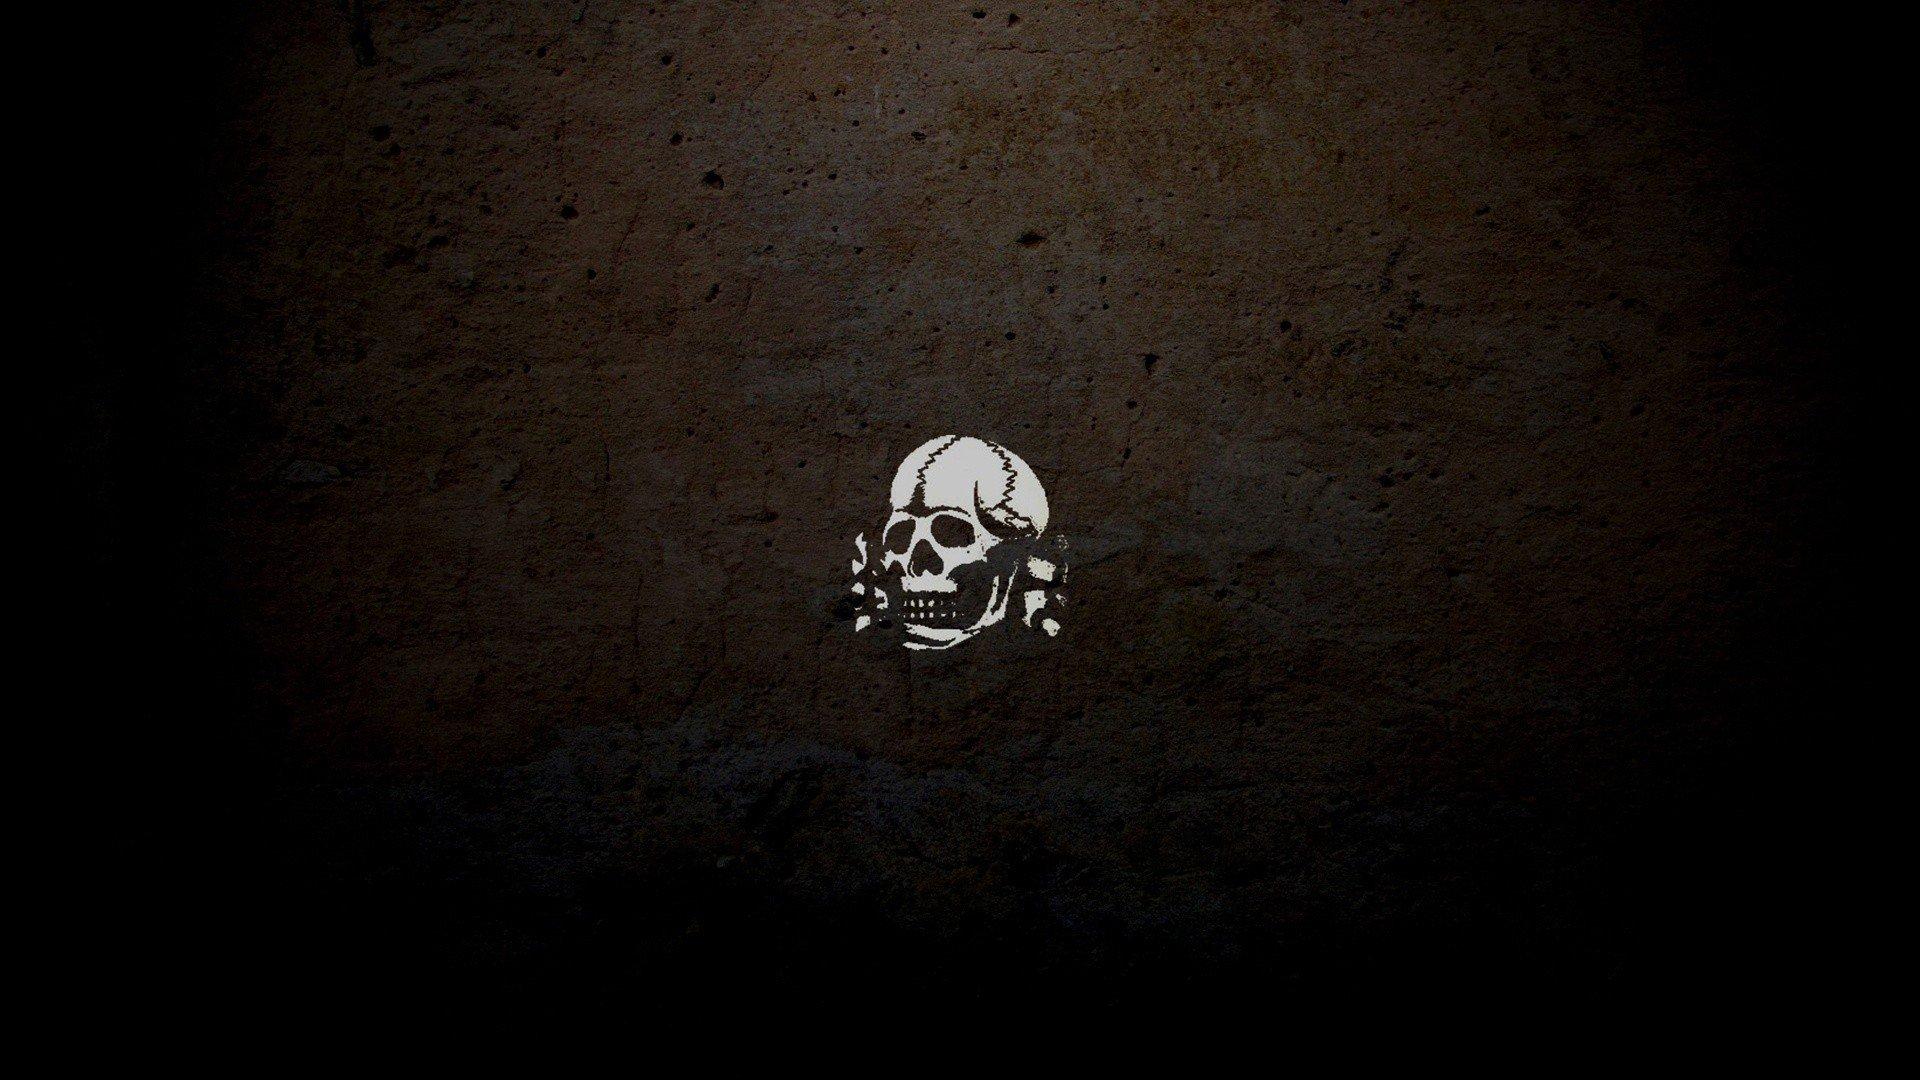 Skull and crossbones wallpaper 1920x1080 286535 WallpaperUP 1920x1080